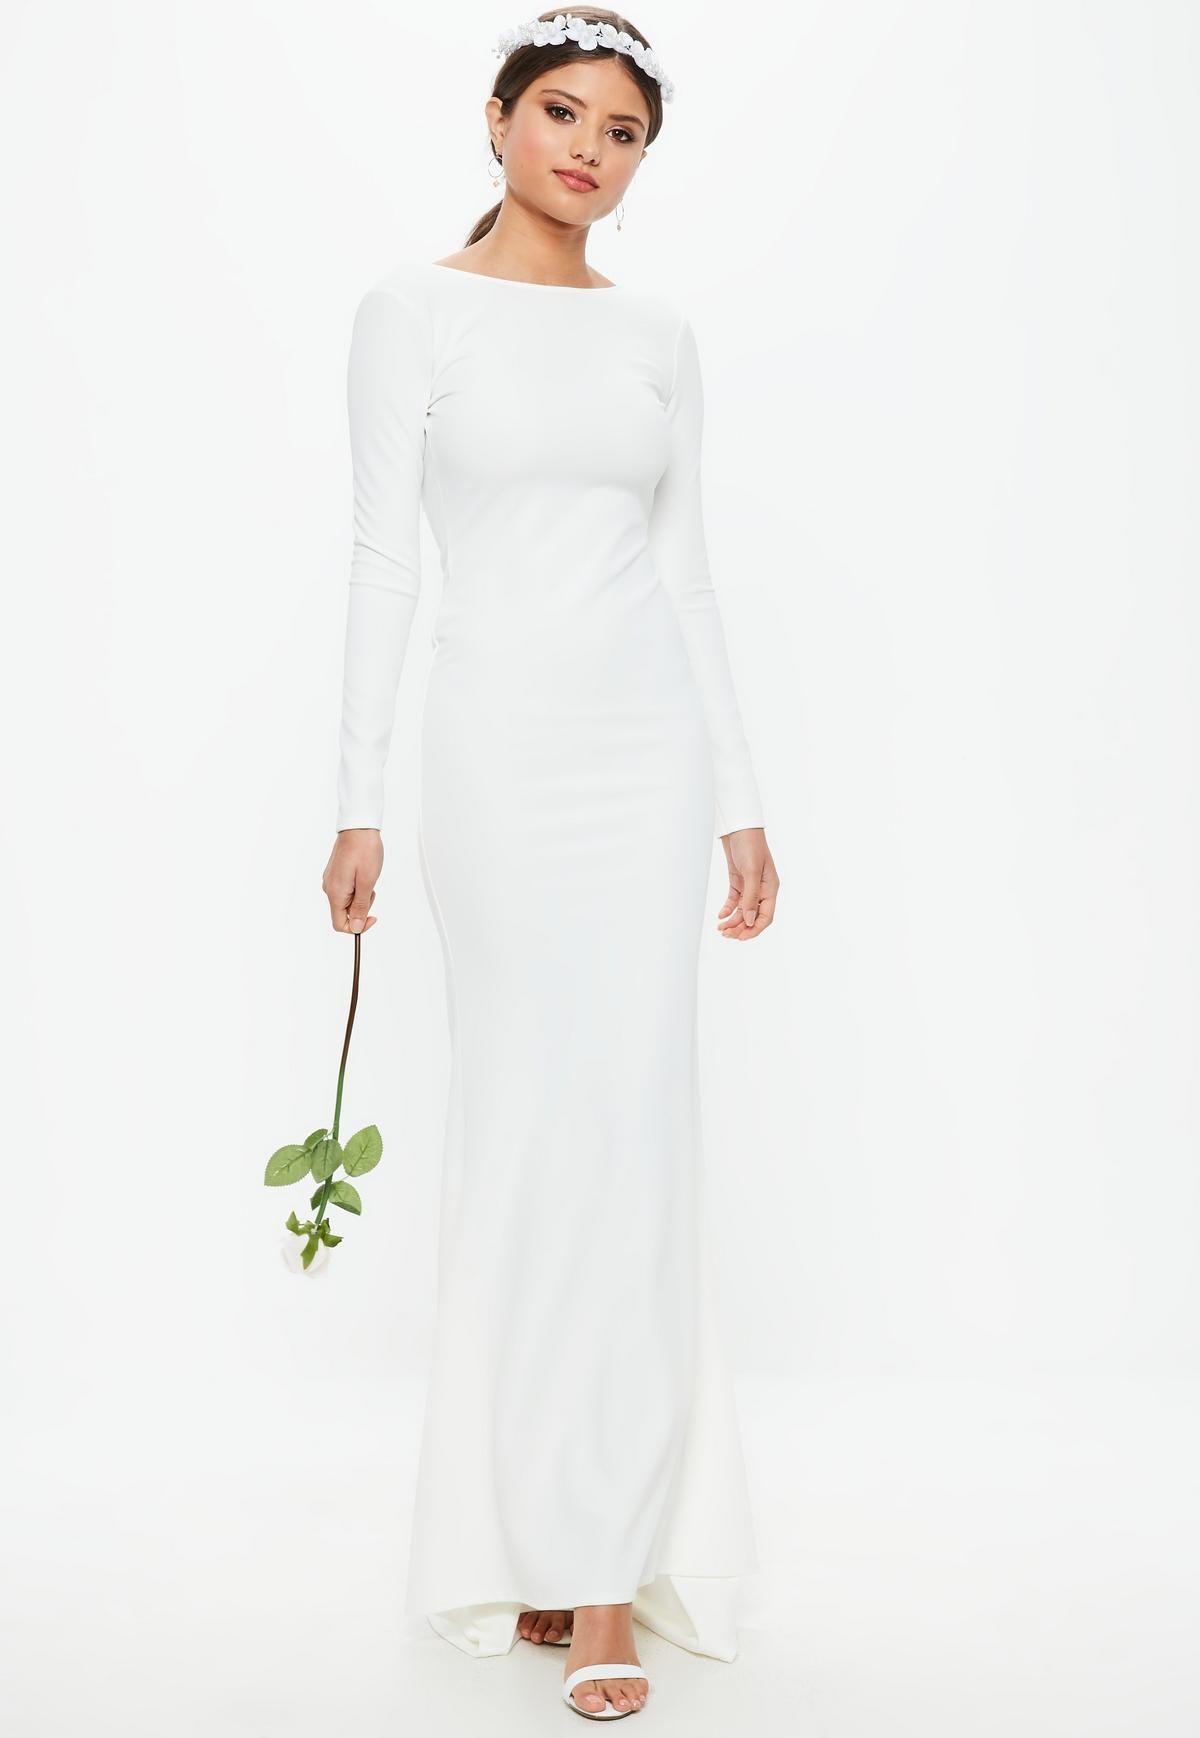 731ae65956 Bridal White Long Sleeve Open Back Fishtail Dress